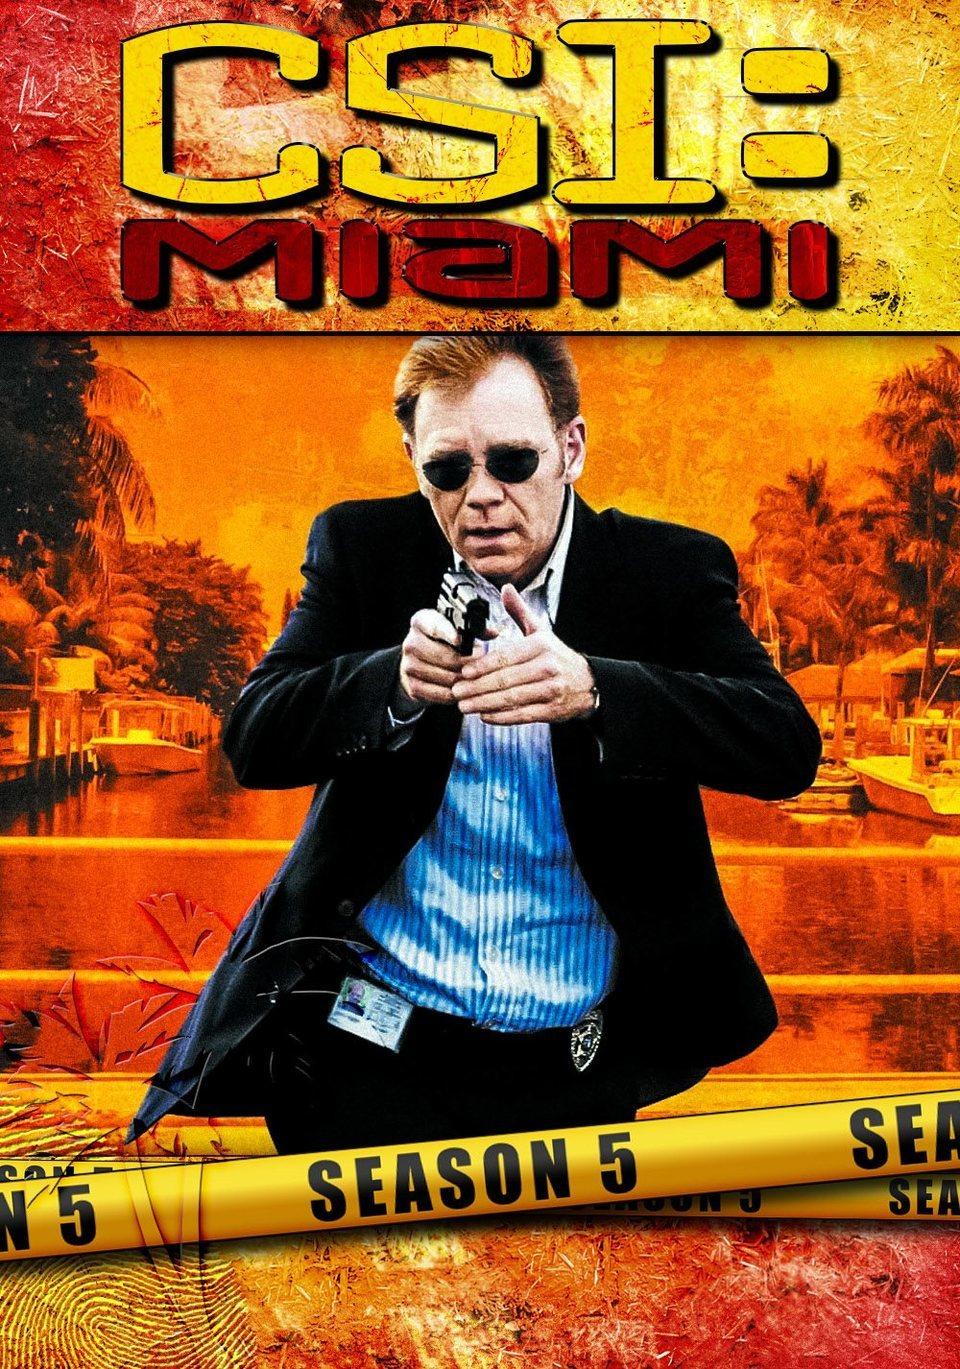 Cartel Temporada 5 de 'CSI: Miami'